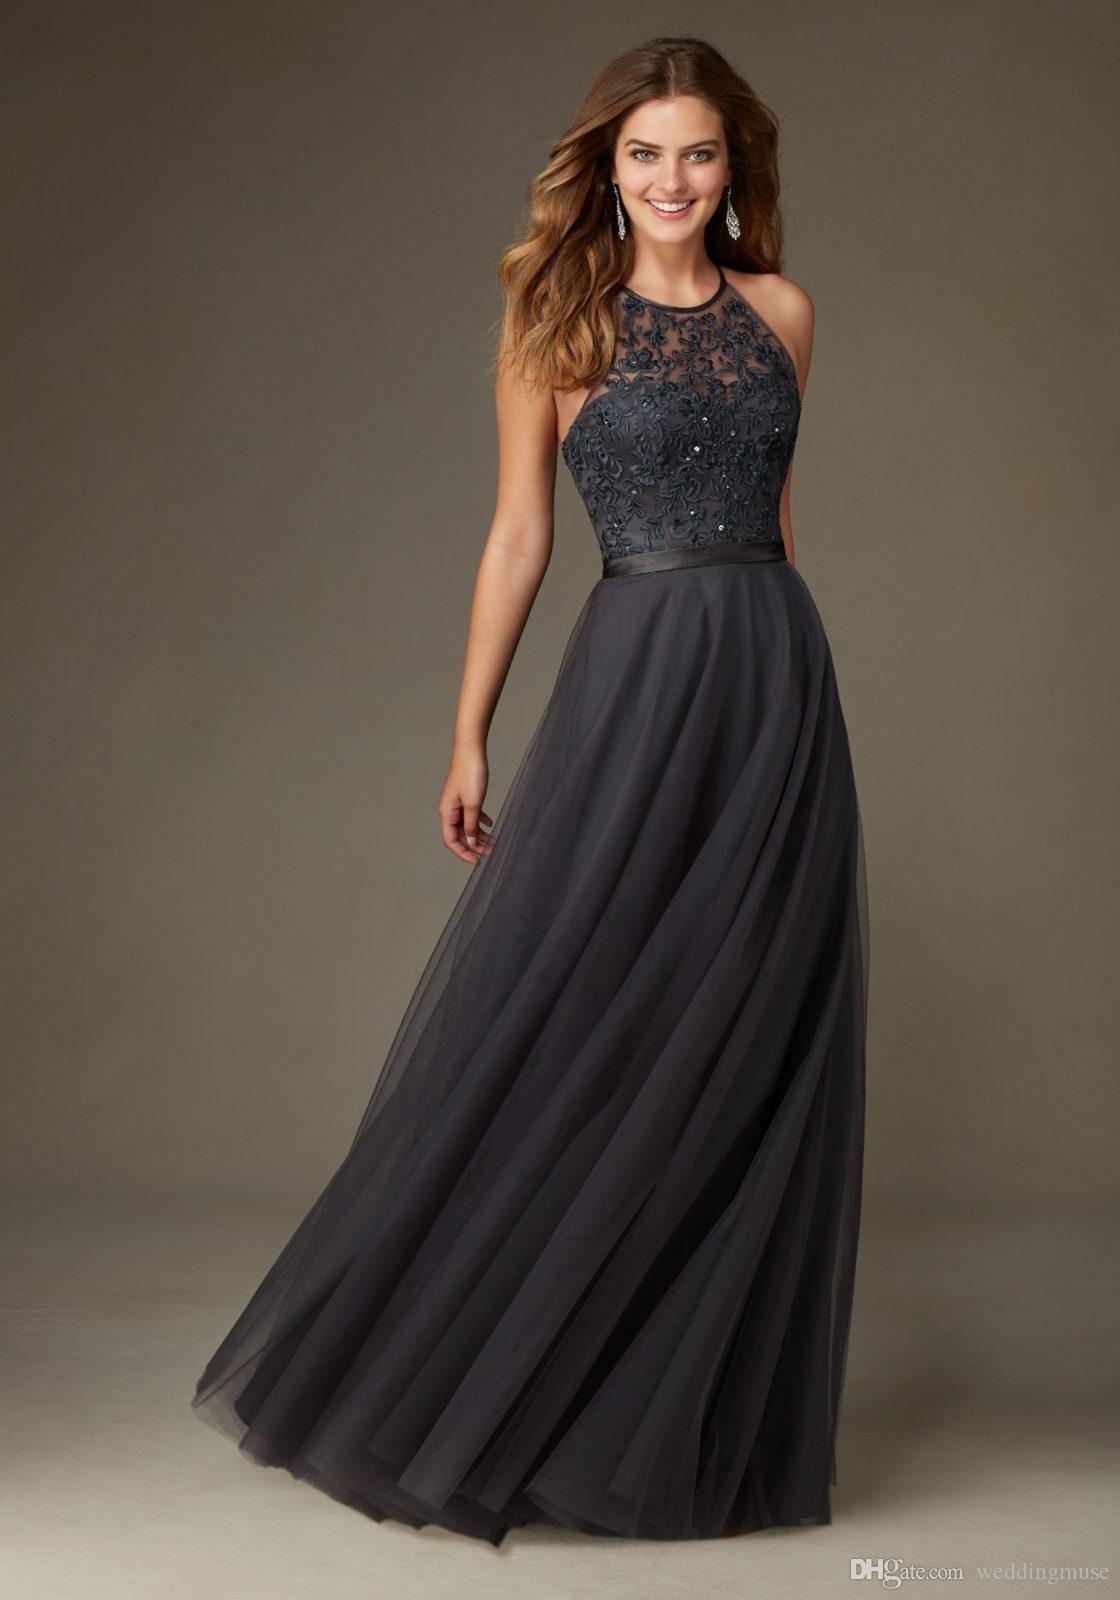 charcoal gray bridesmaid dresses long halter sleeveless a line